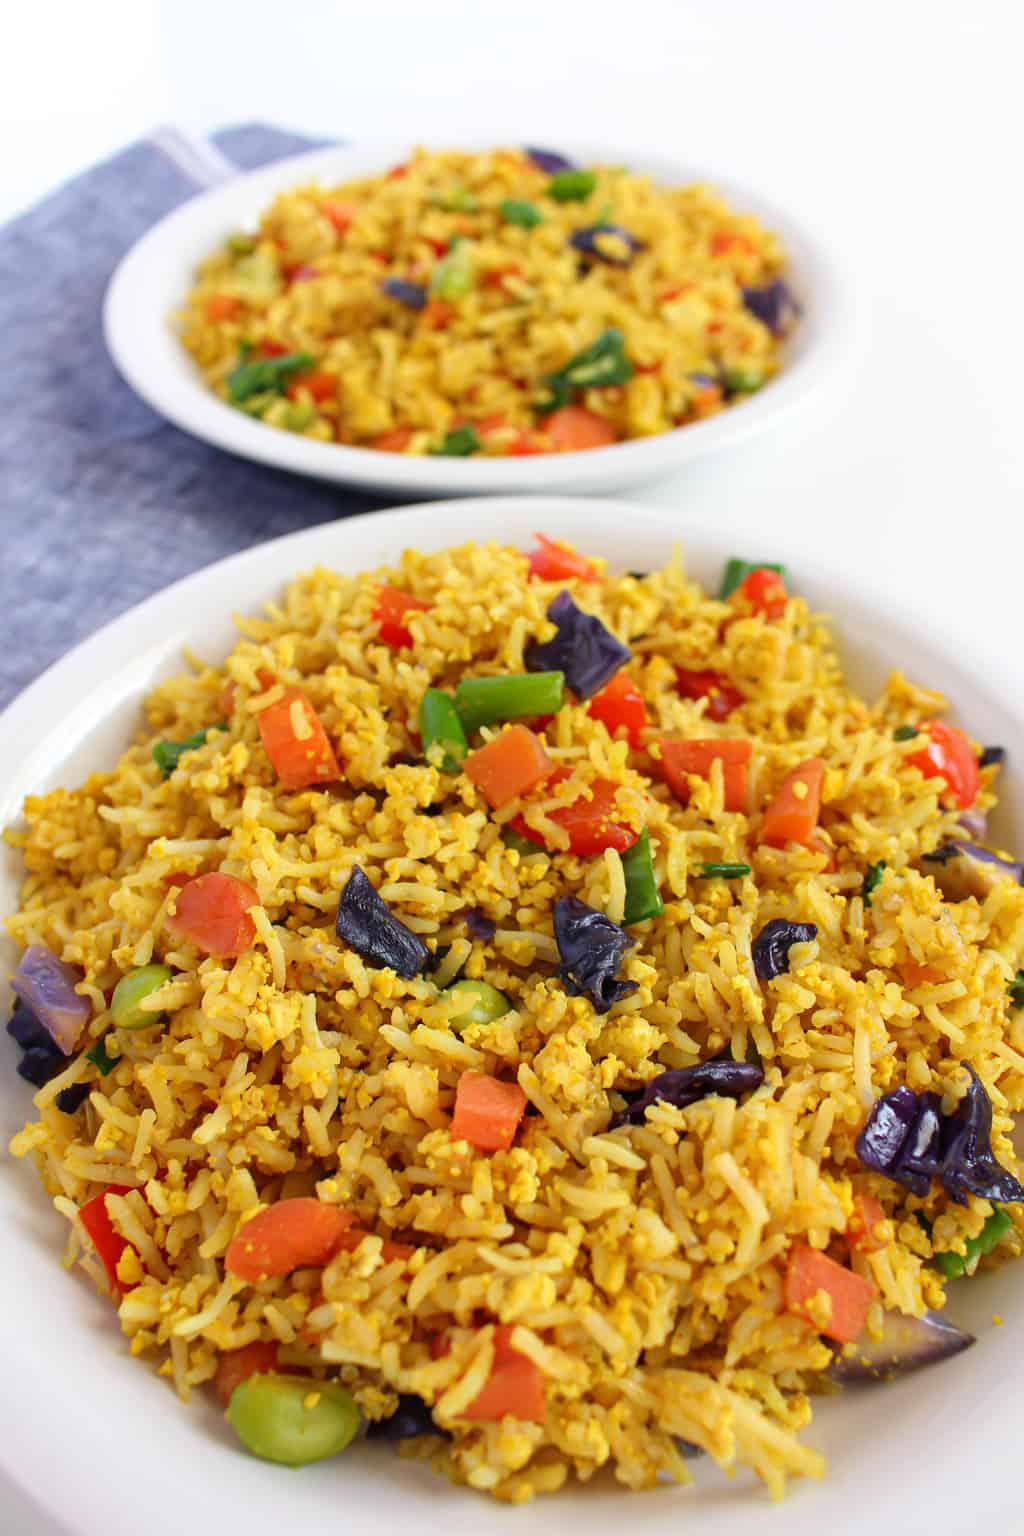 2 plates of gluten free, vegan low FODMAP fried rice